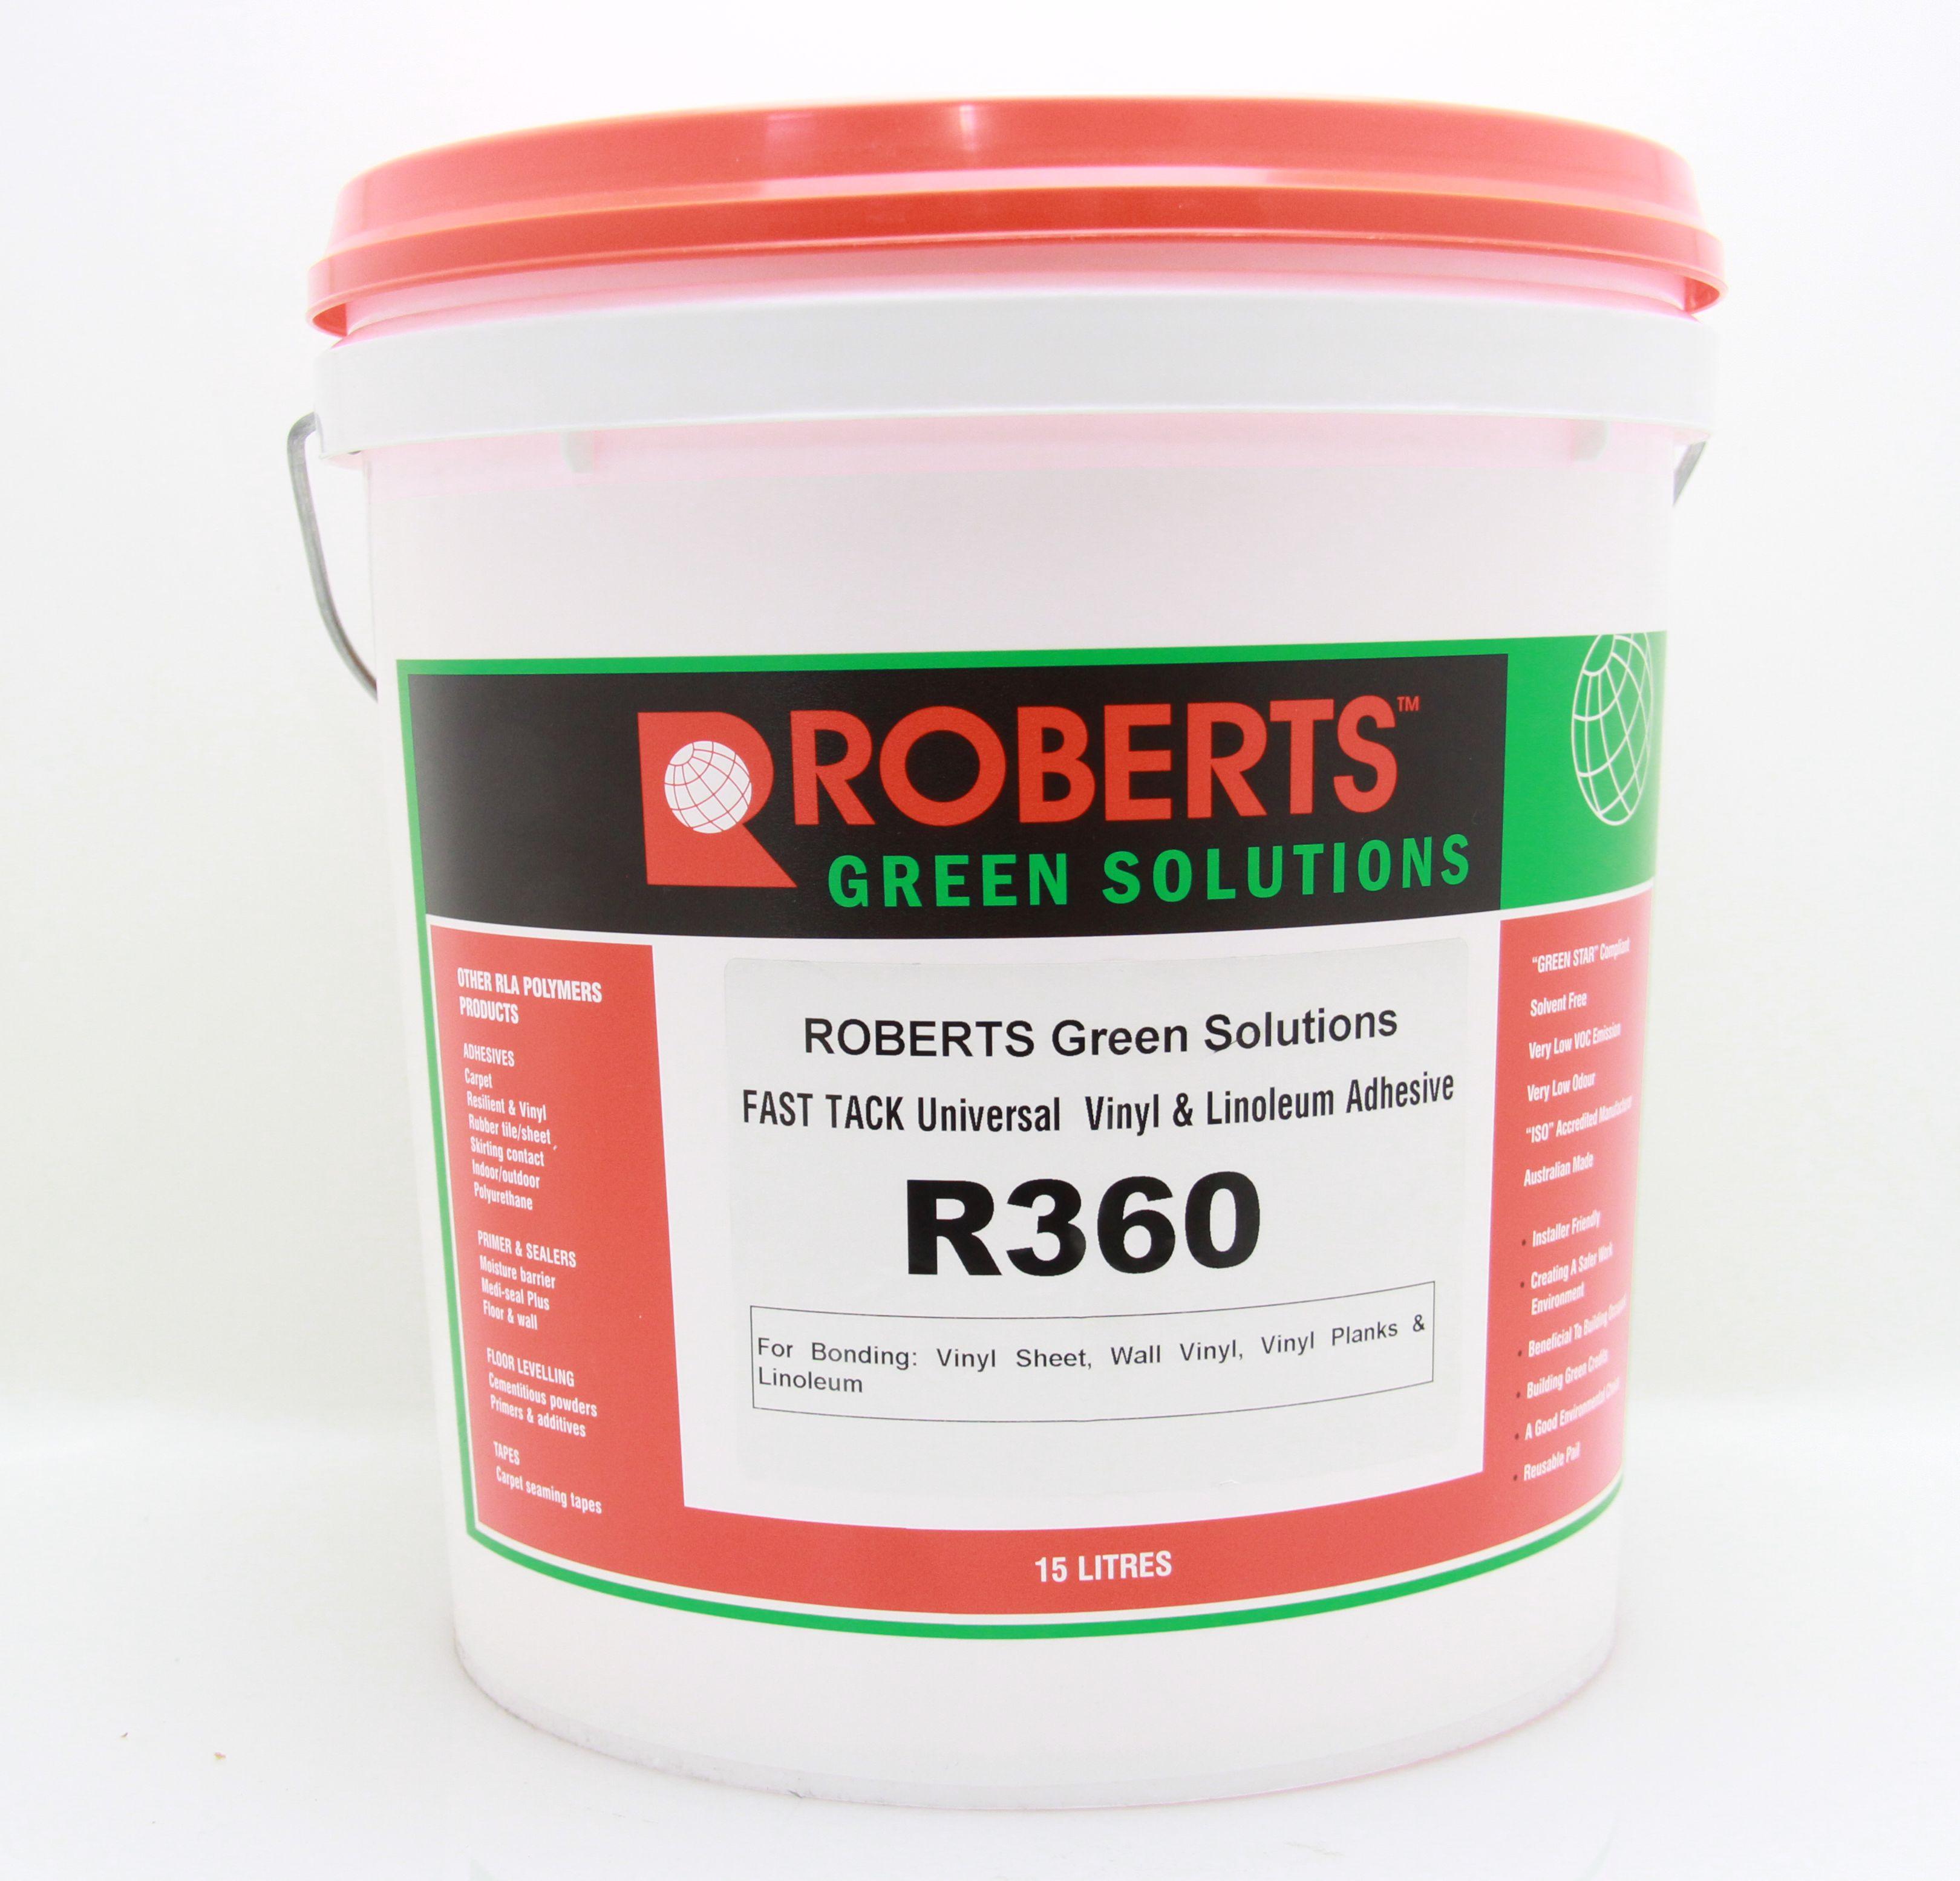 R360 Fast Grab Vinyl & Linoleum Adhesive